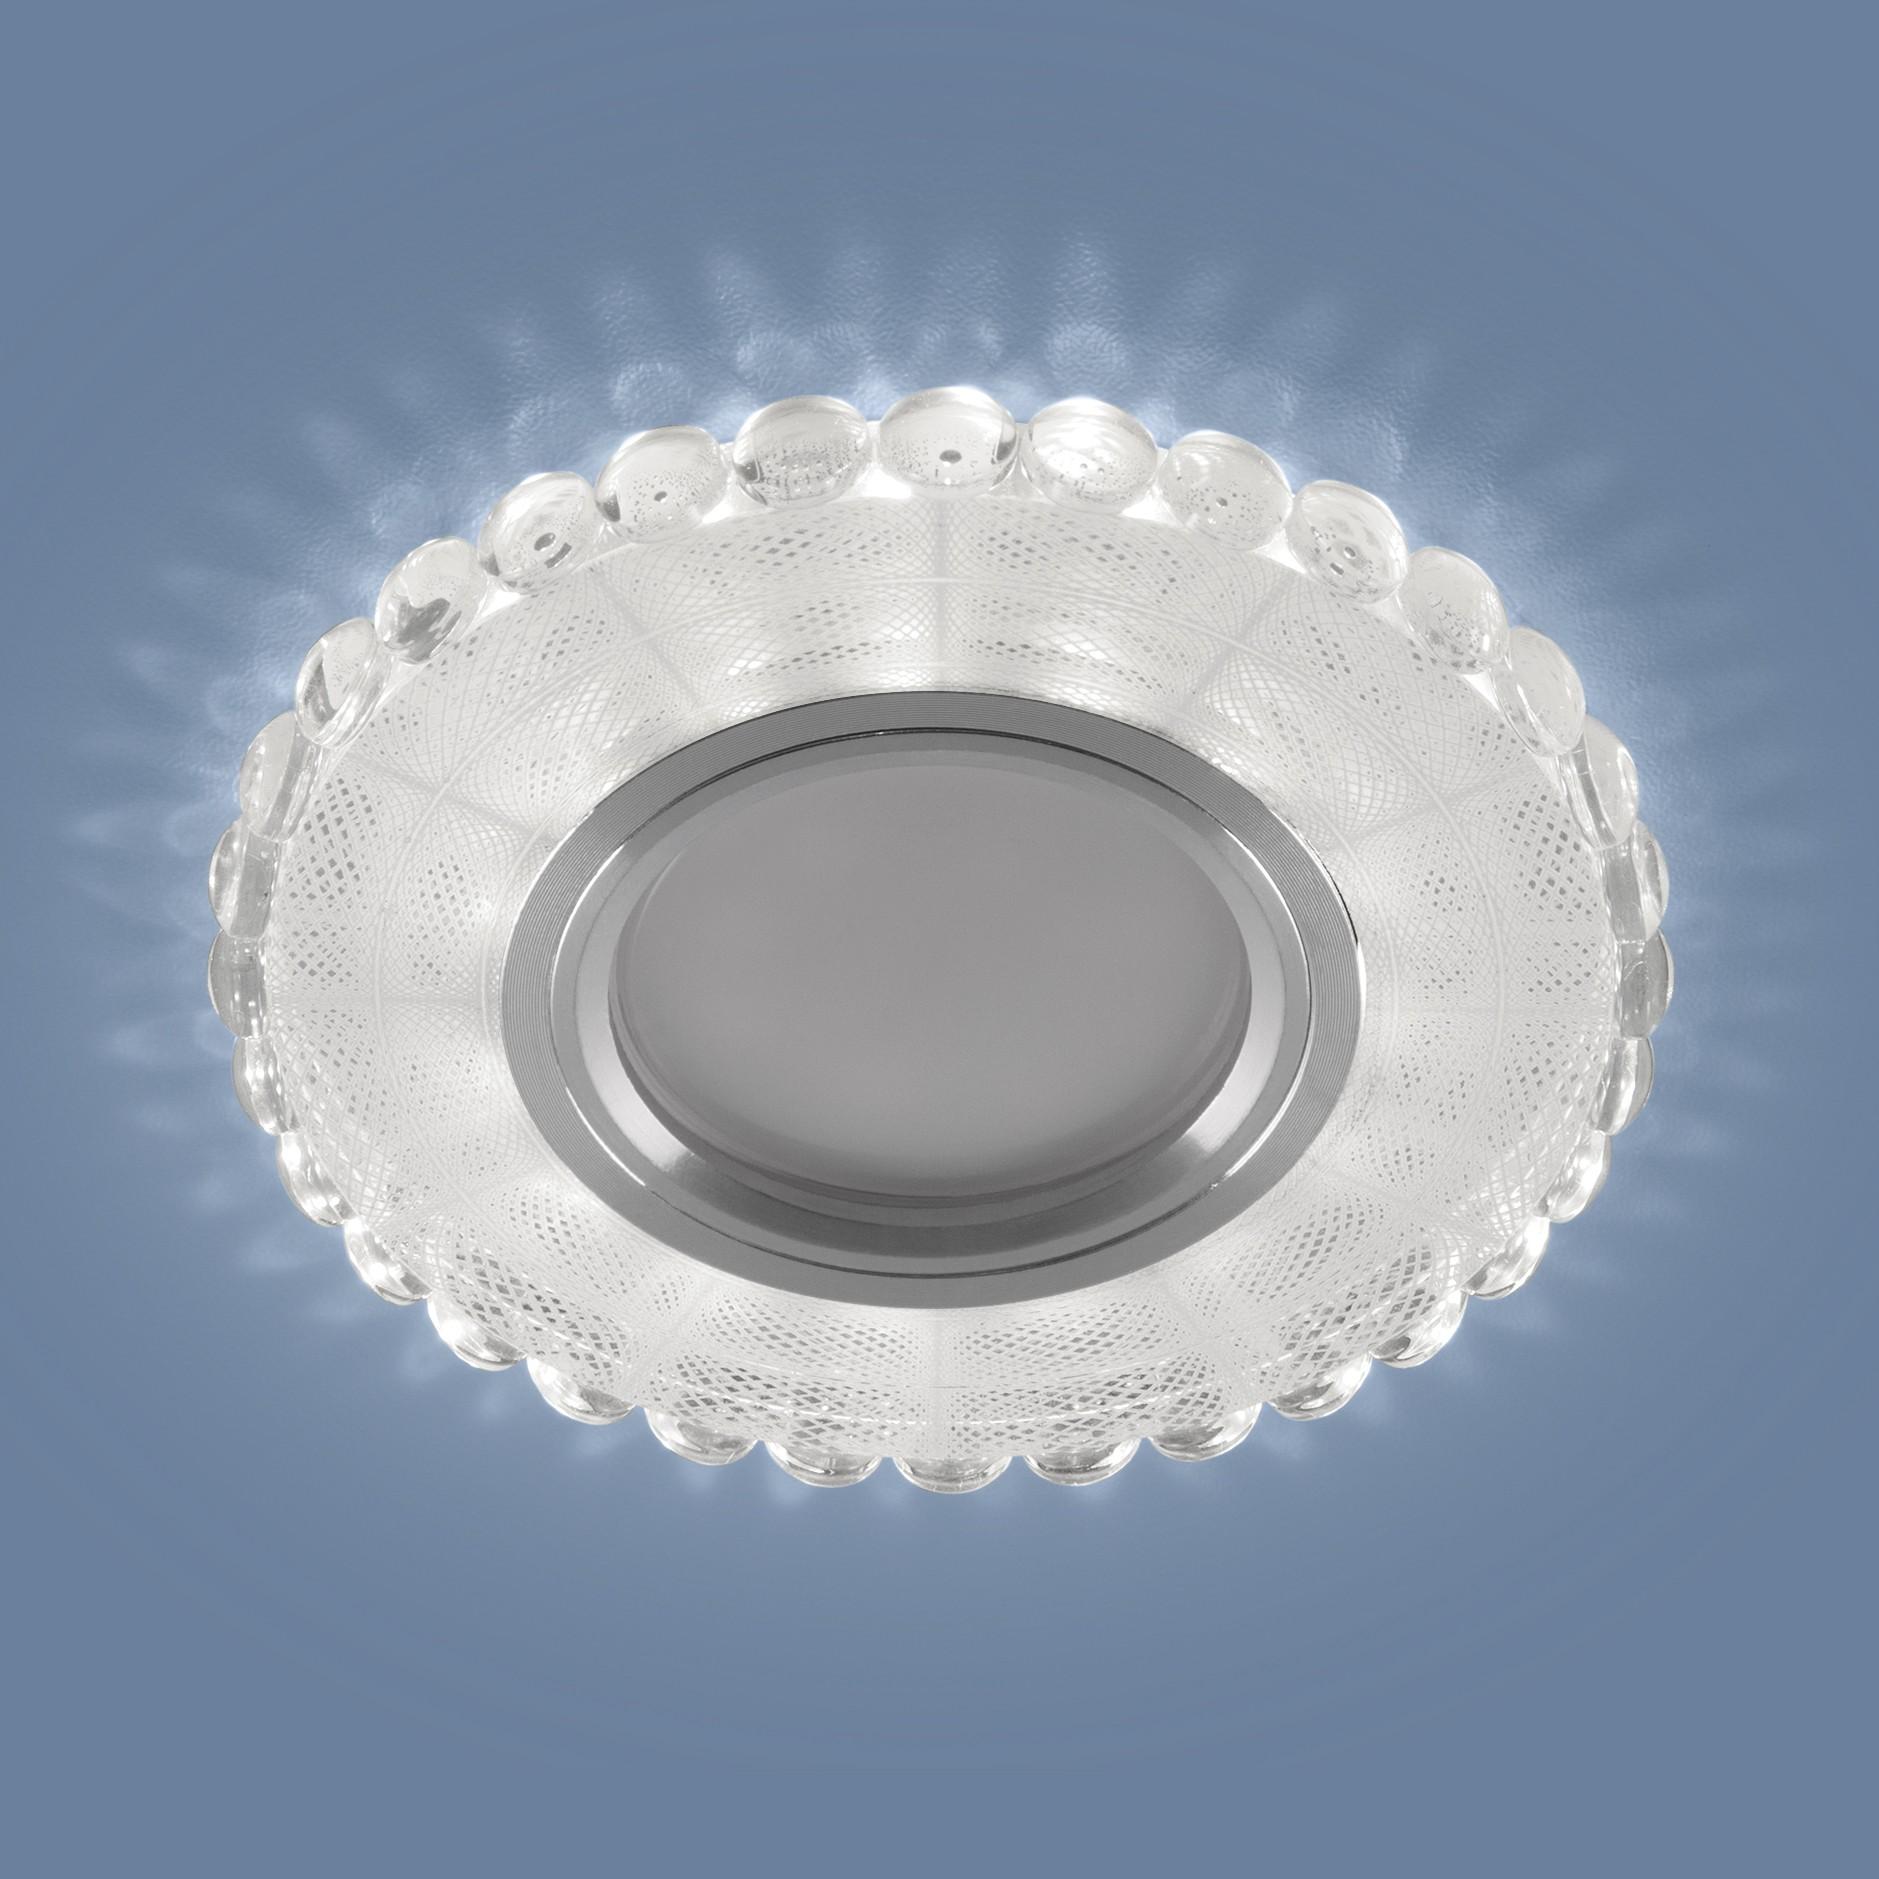 2245 MR16 SL/WH зеркальный/белый